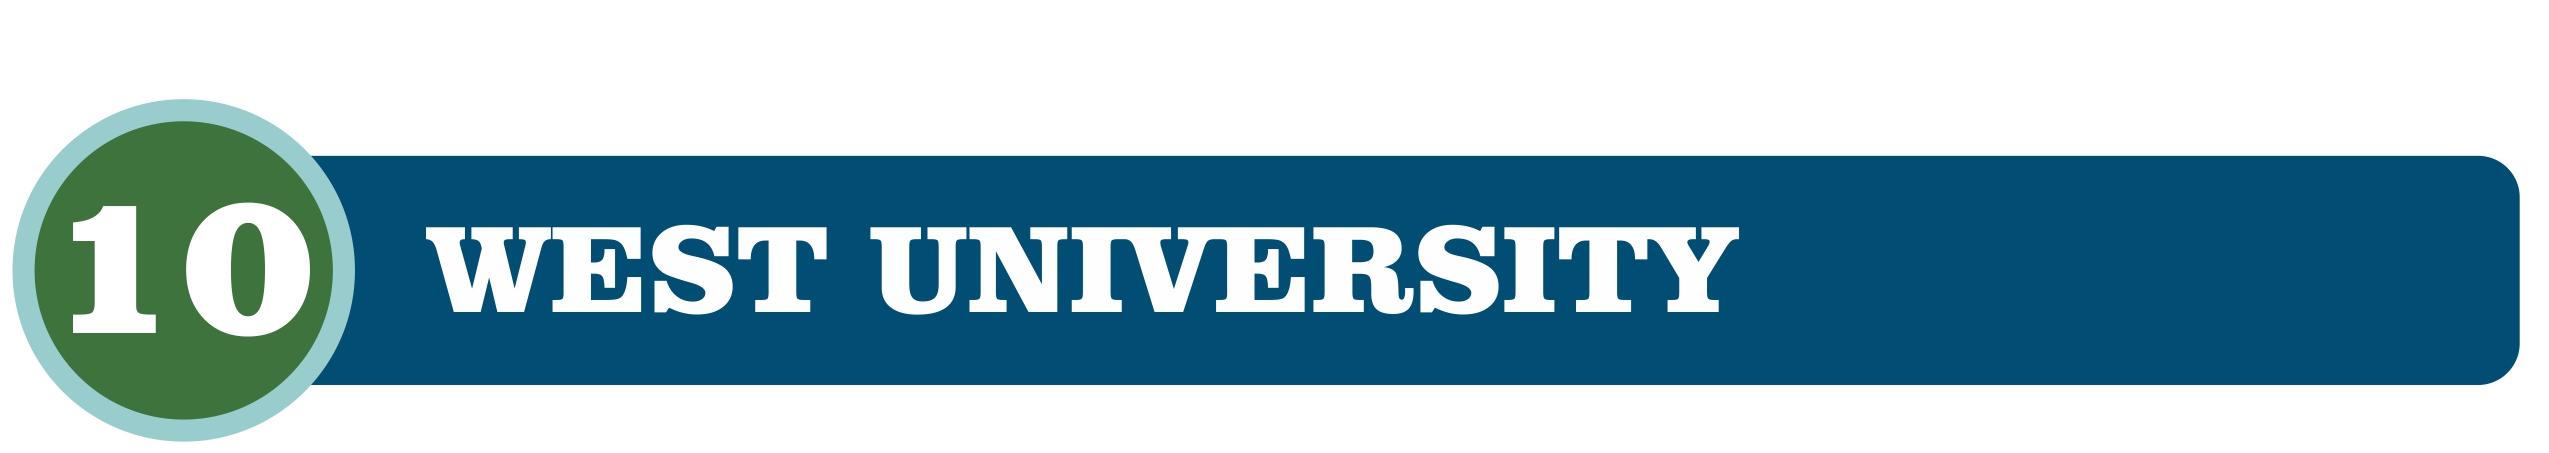 West University Header